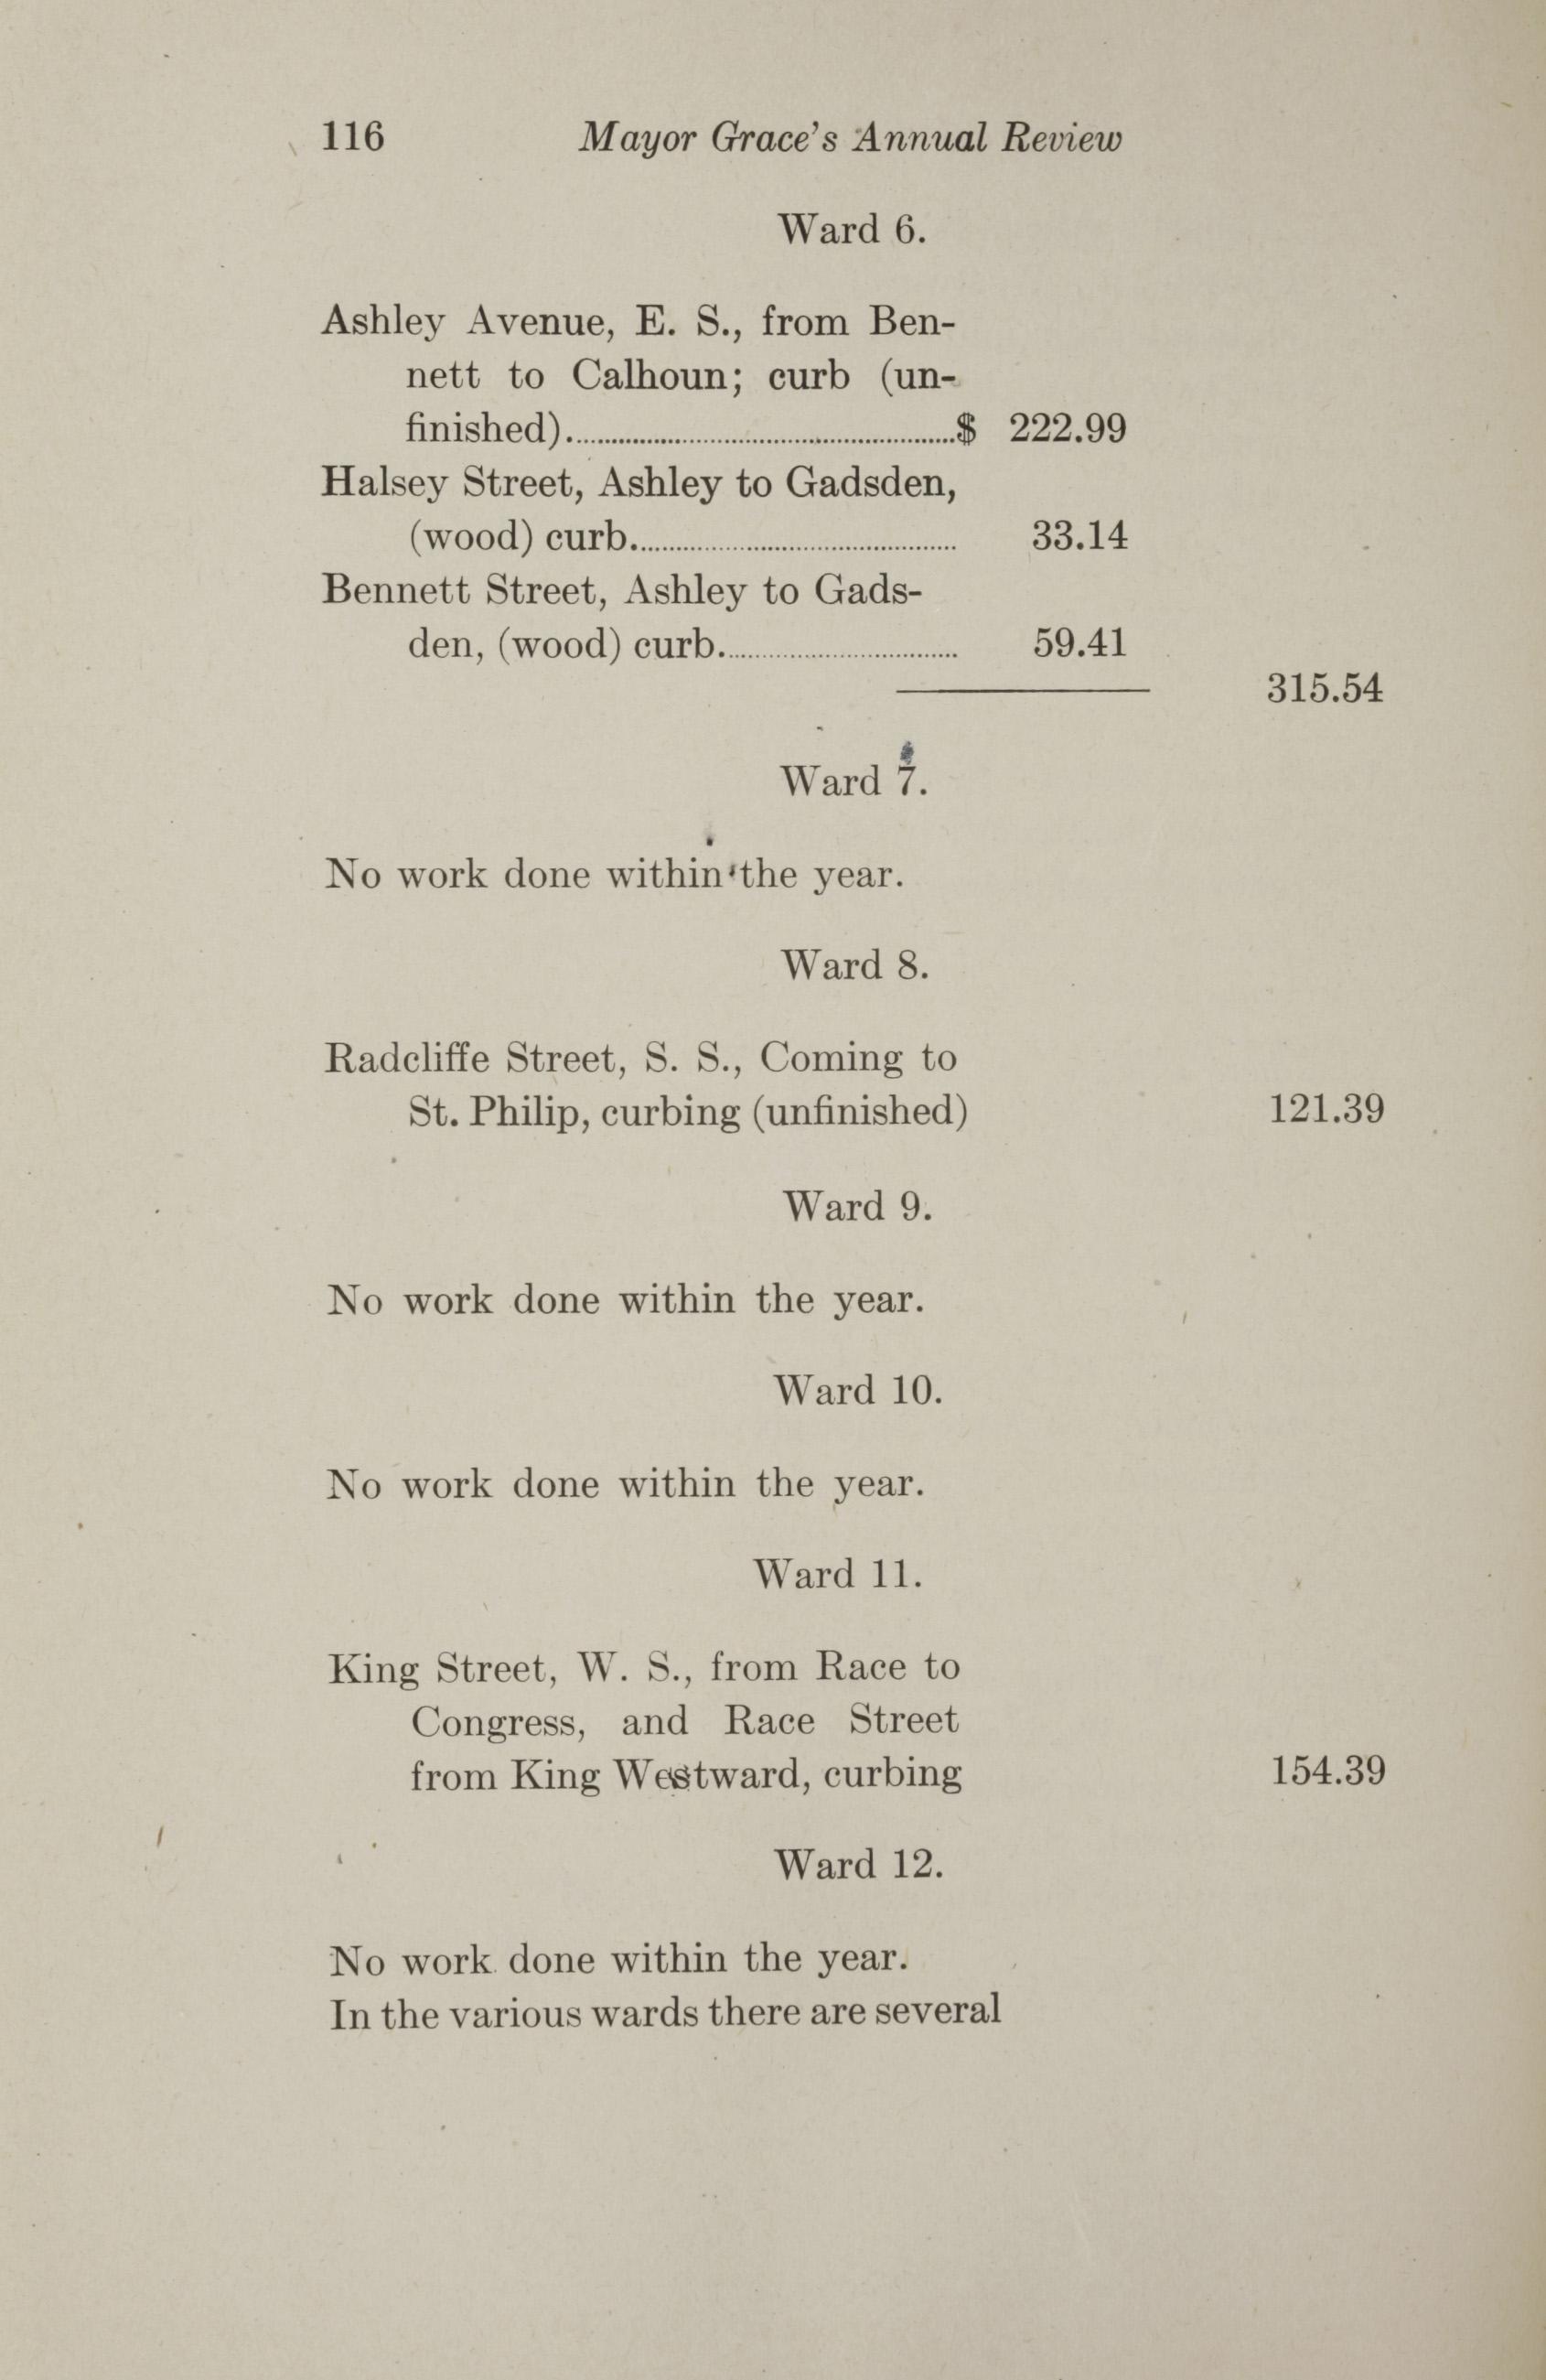 Charleston Yearbook, 1912, page 116